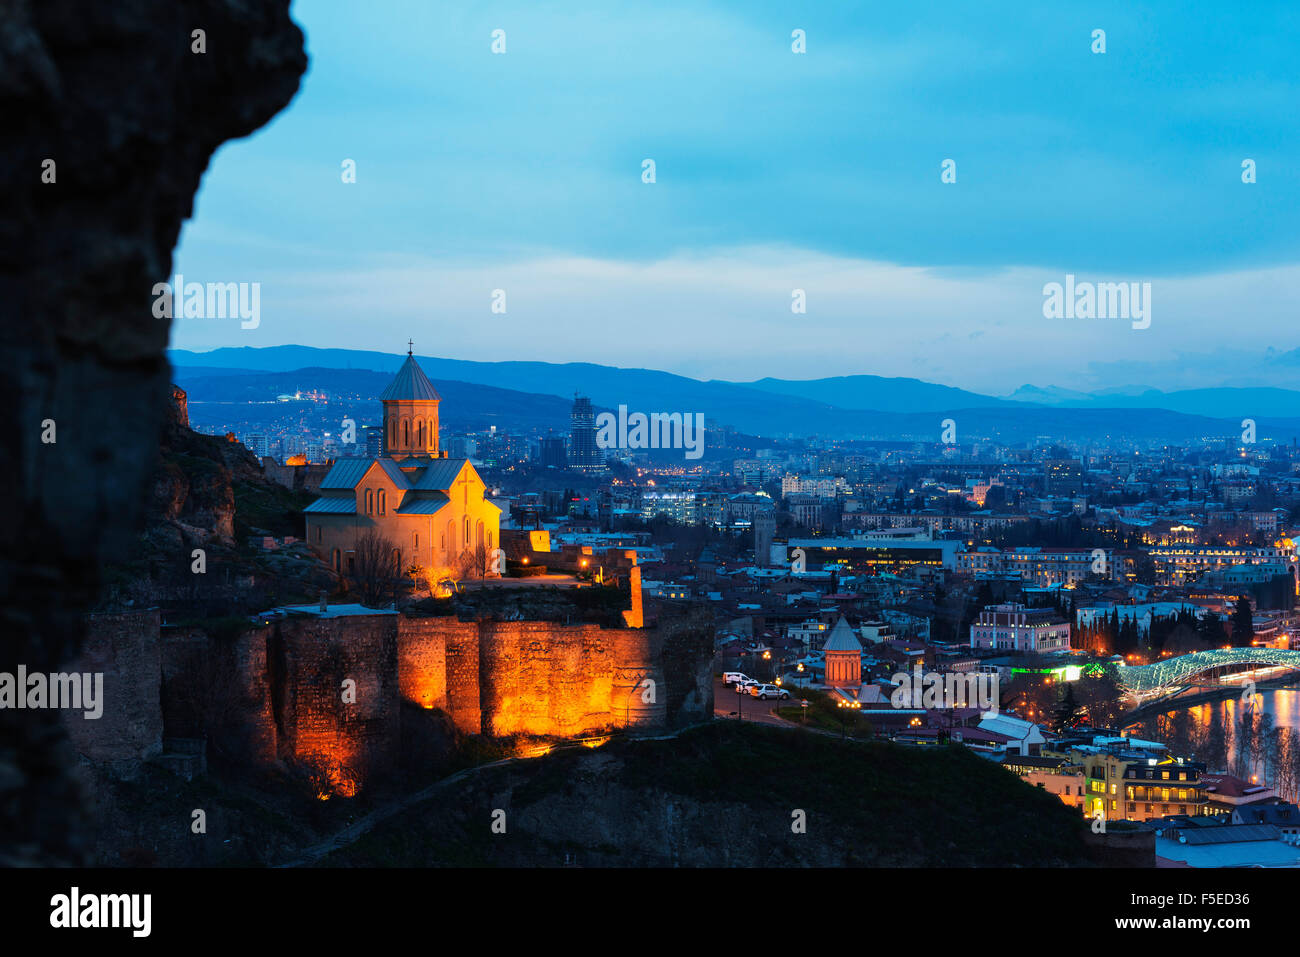 St.-Nikolaus-Kirche auf der Oberseite Narikala Festung, Tiflis, Georgien, Kaukasus, Zentralasien, Asien Stockbild